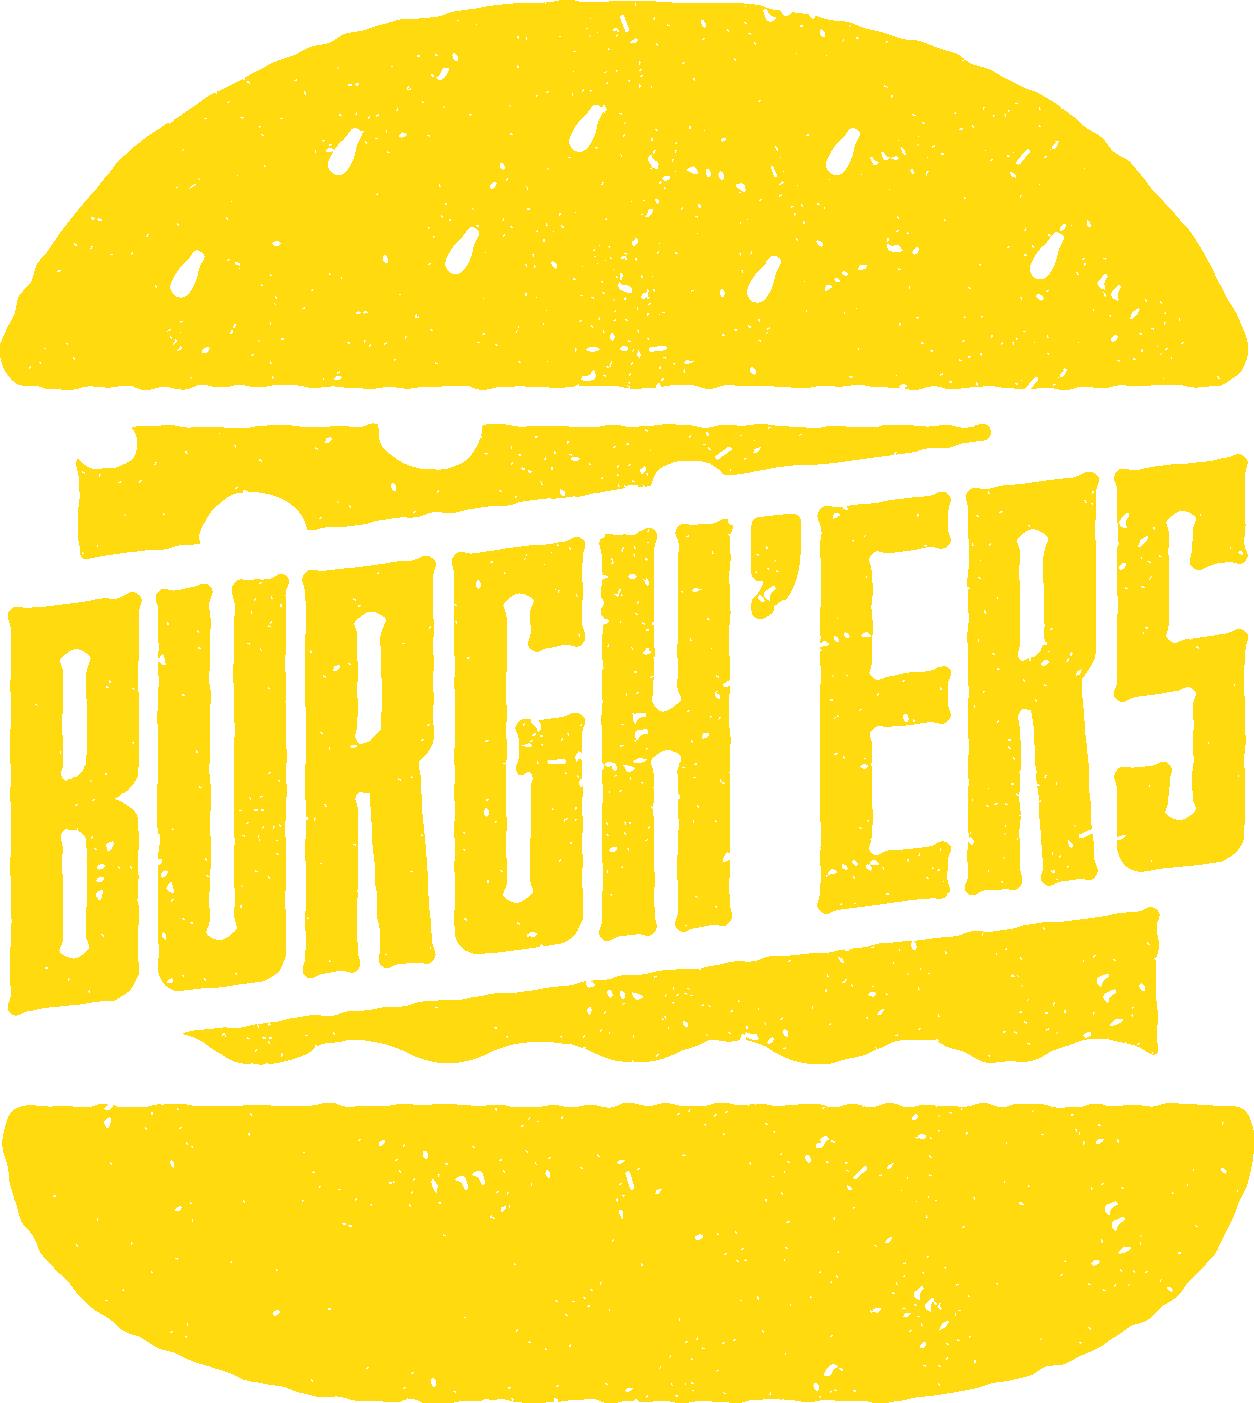 Burgh'ers logo.png